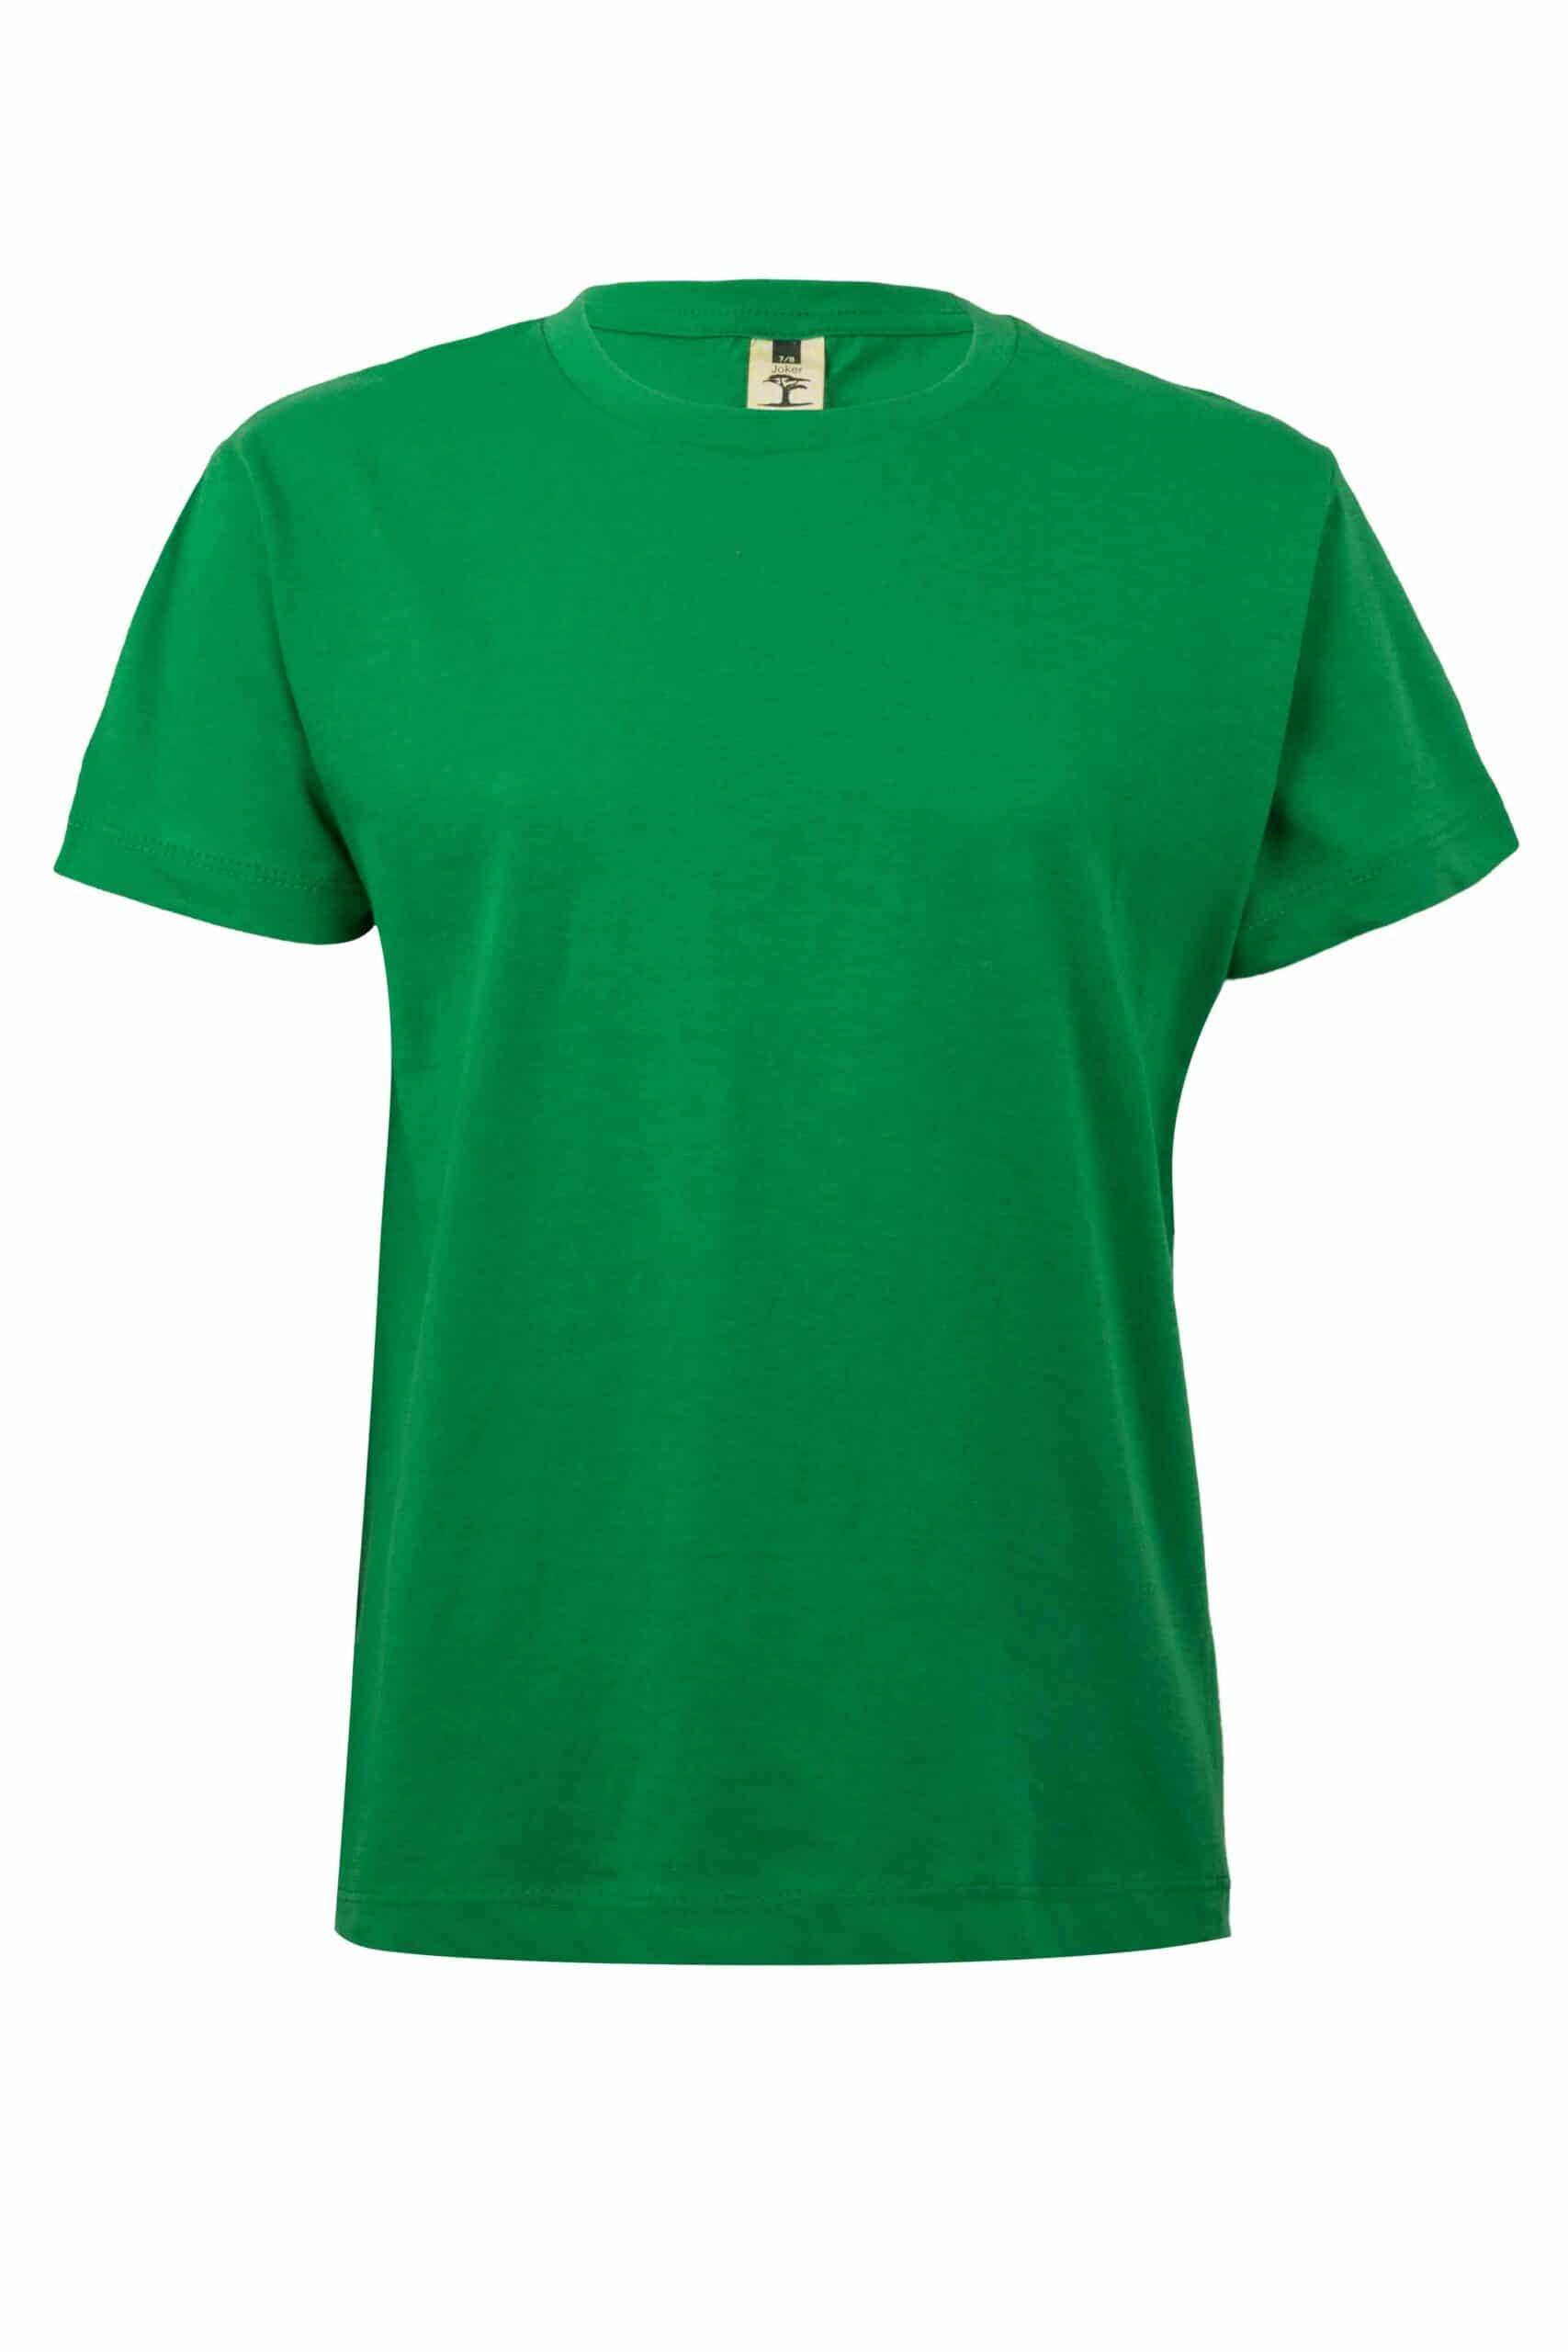 Mukua Mk175cv Camiseta Manga Corta NiÑo Real Green